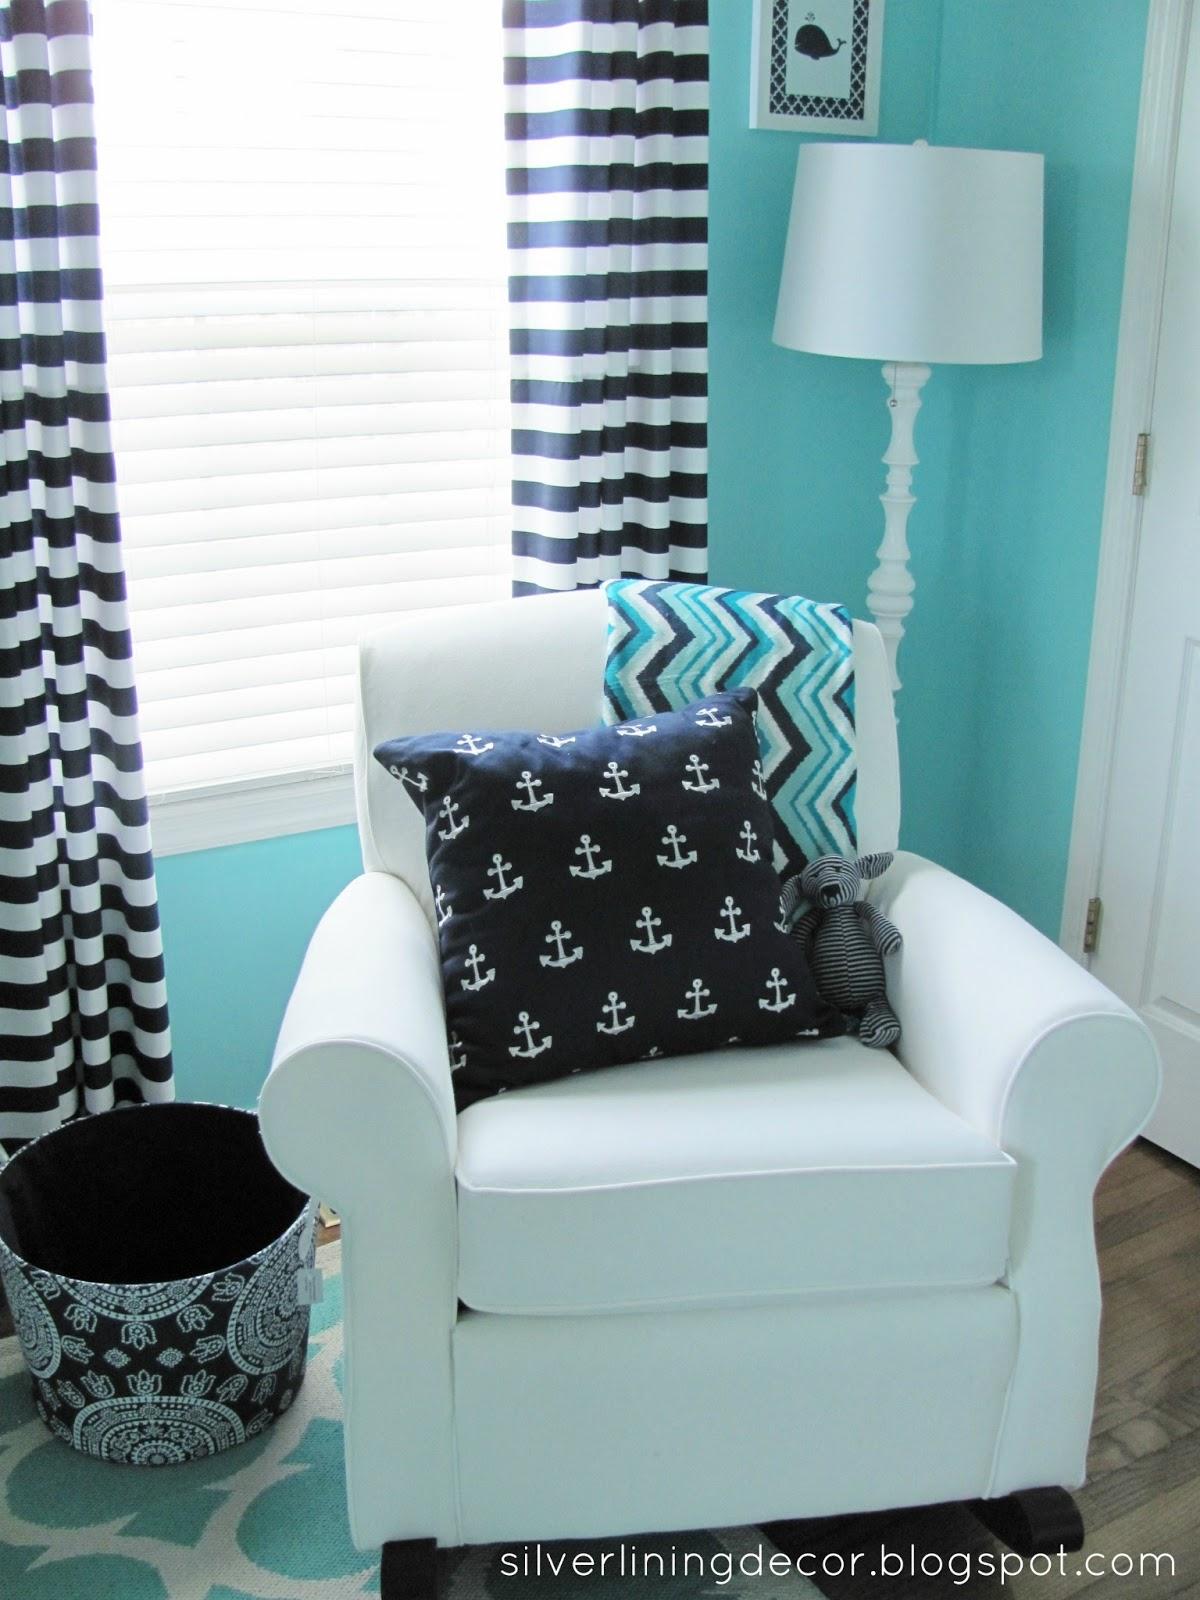 silver lining decor nautical nursery reveal. Black Bedroom Furniture Sets. Home Design Ideas